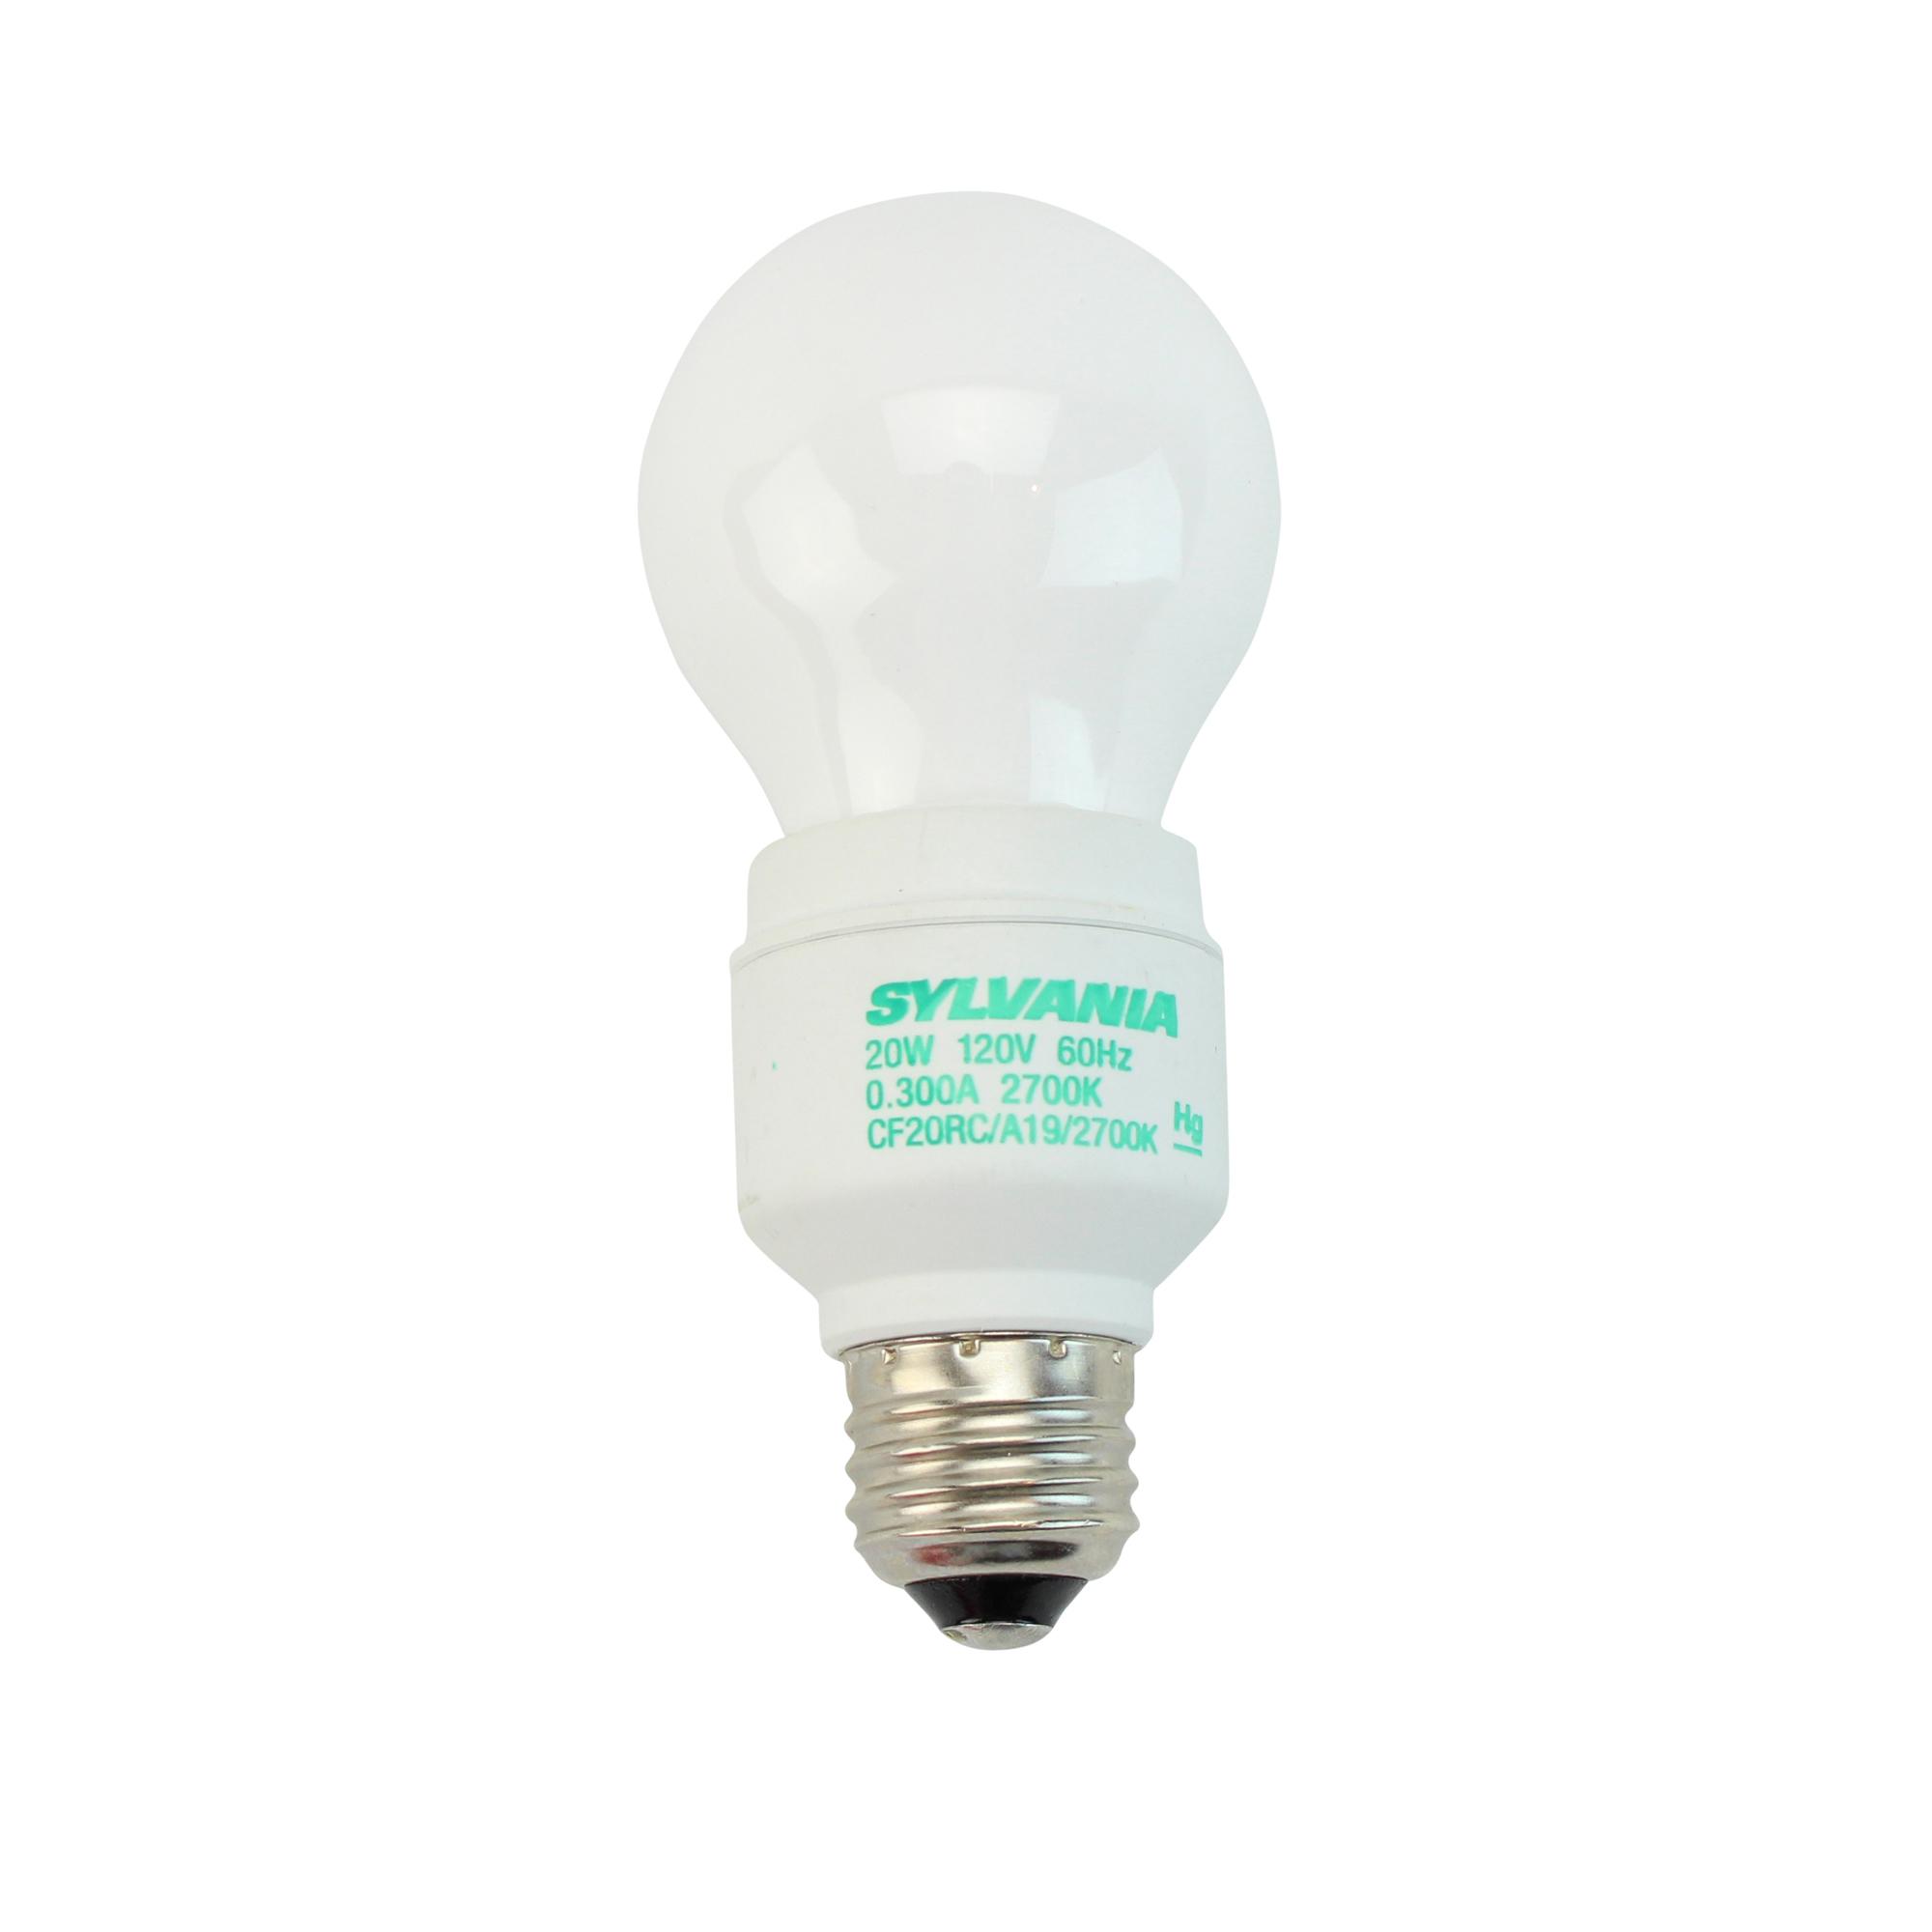 20w Led Bulb A19: SYLVANIA CF20RC/A19/827 29537 A19 E26, 2700K, CFL LIGHT